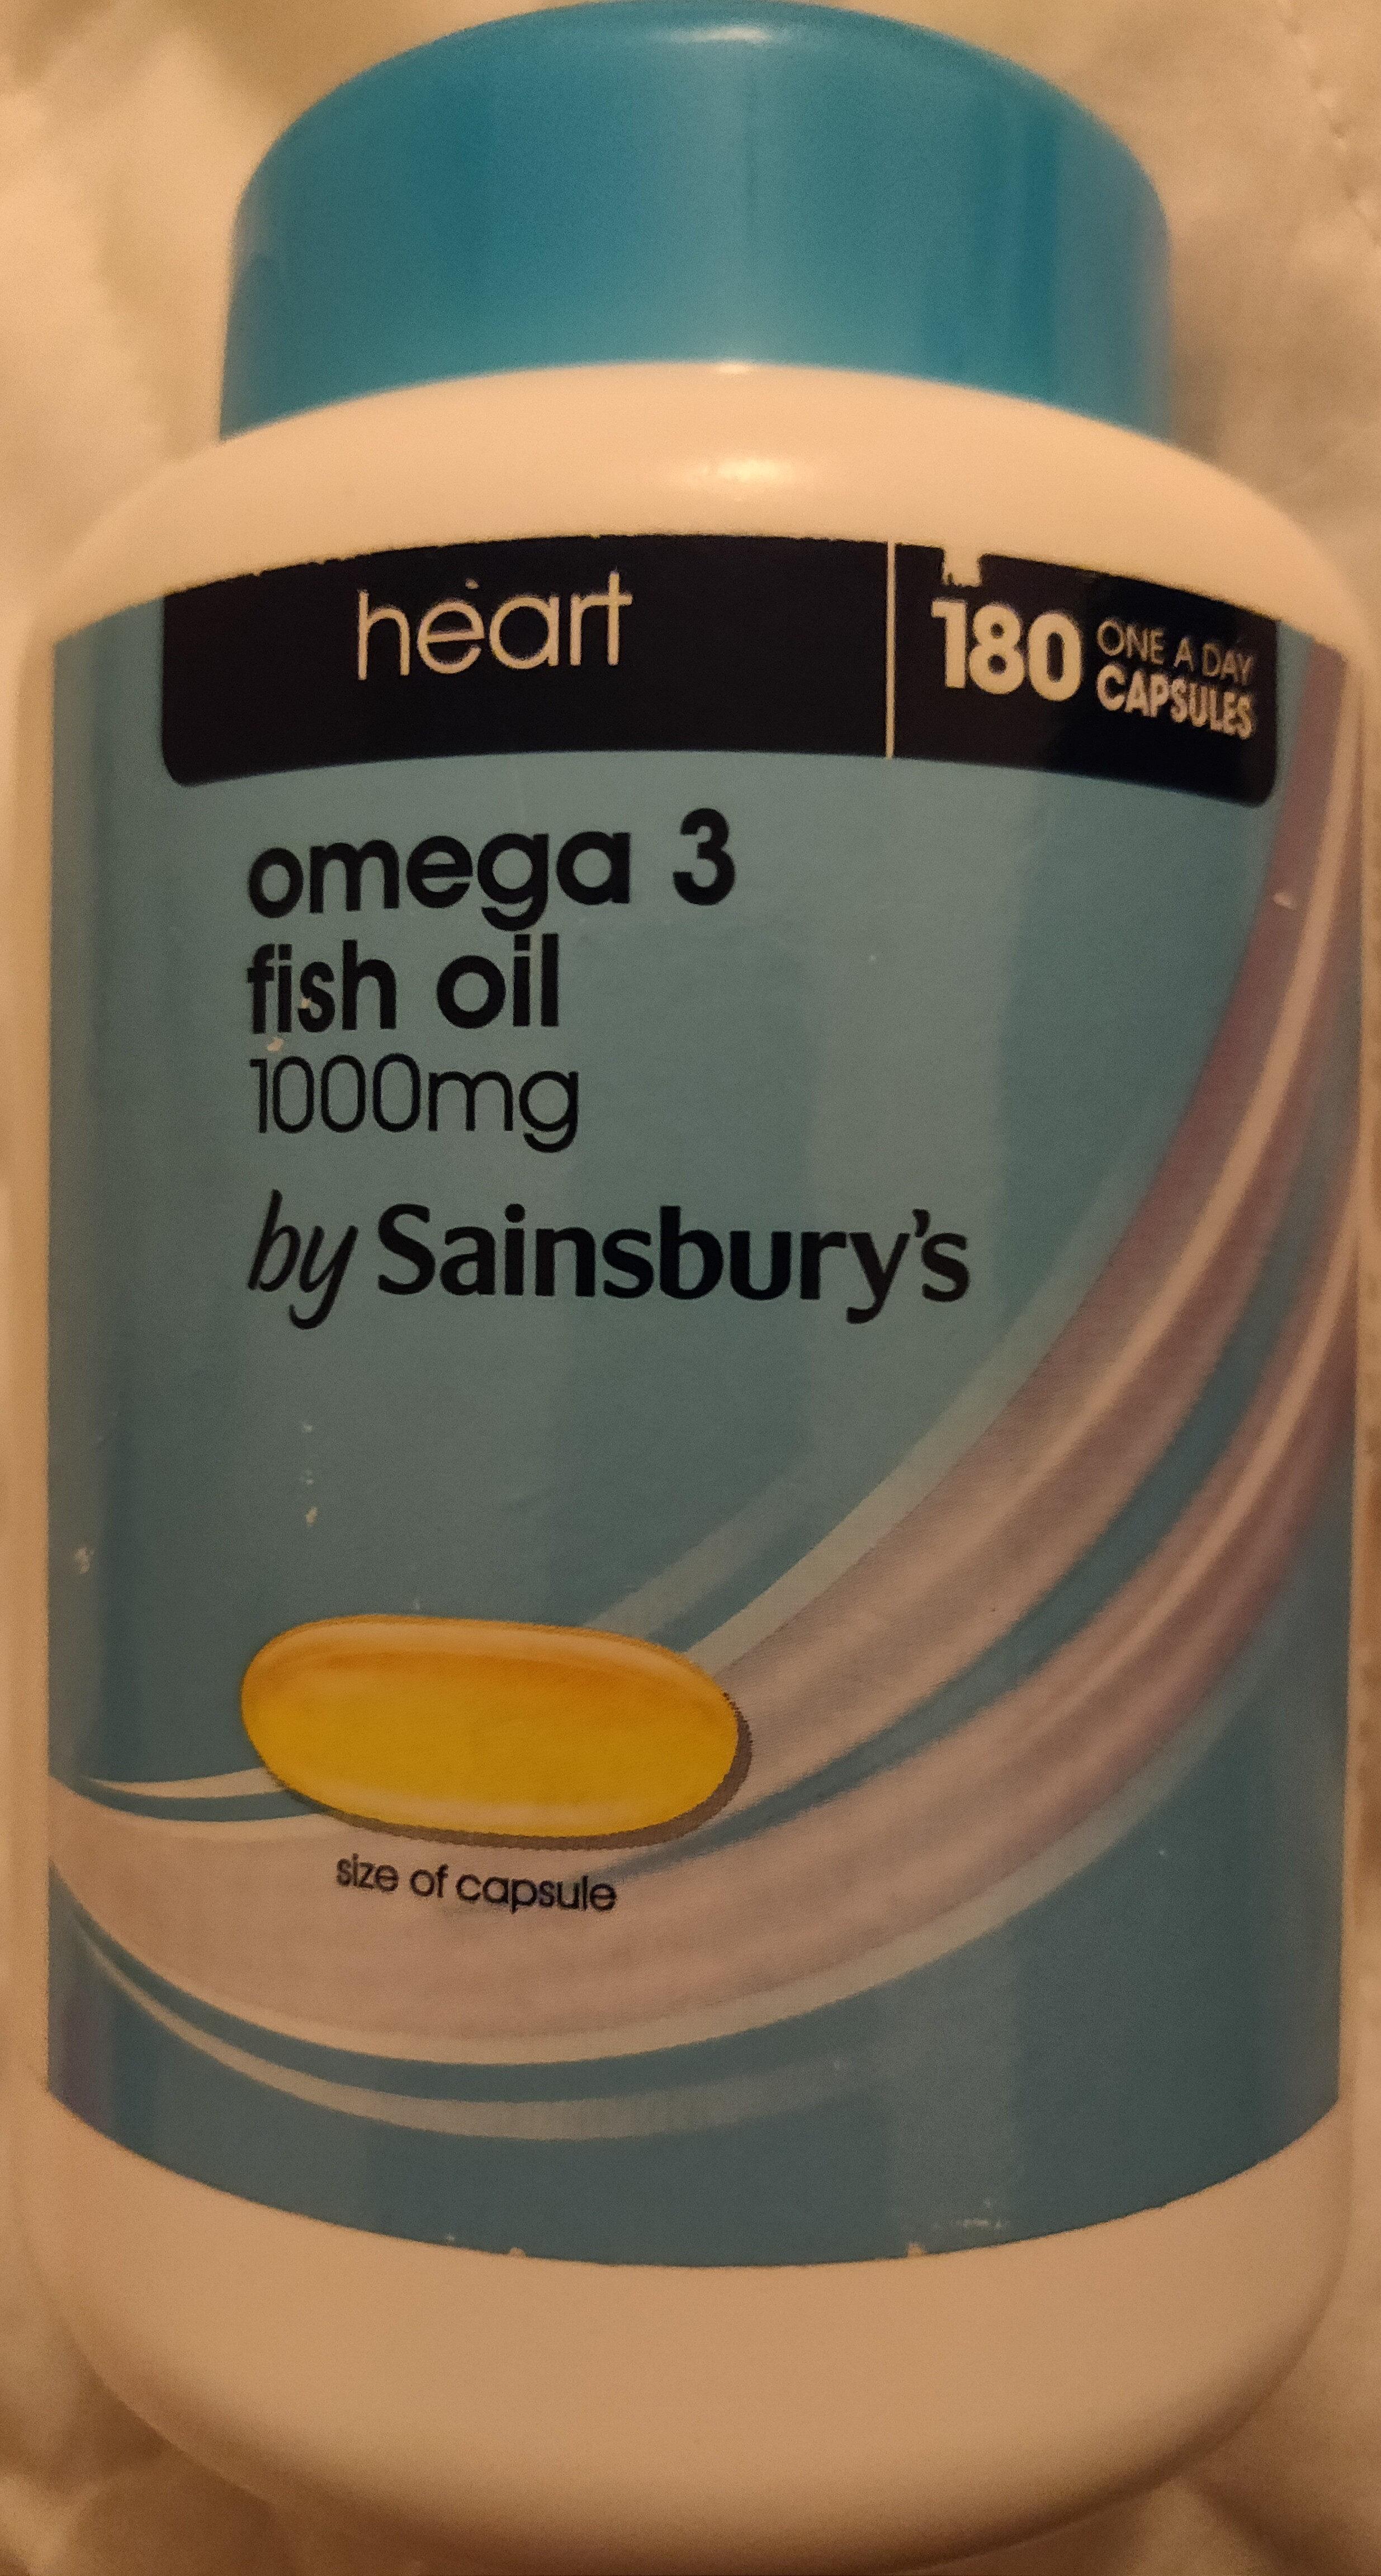 Omega 3 fish oil - Produit - en